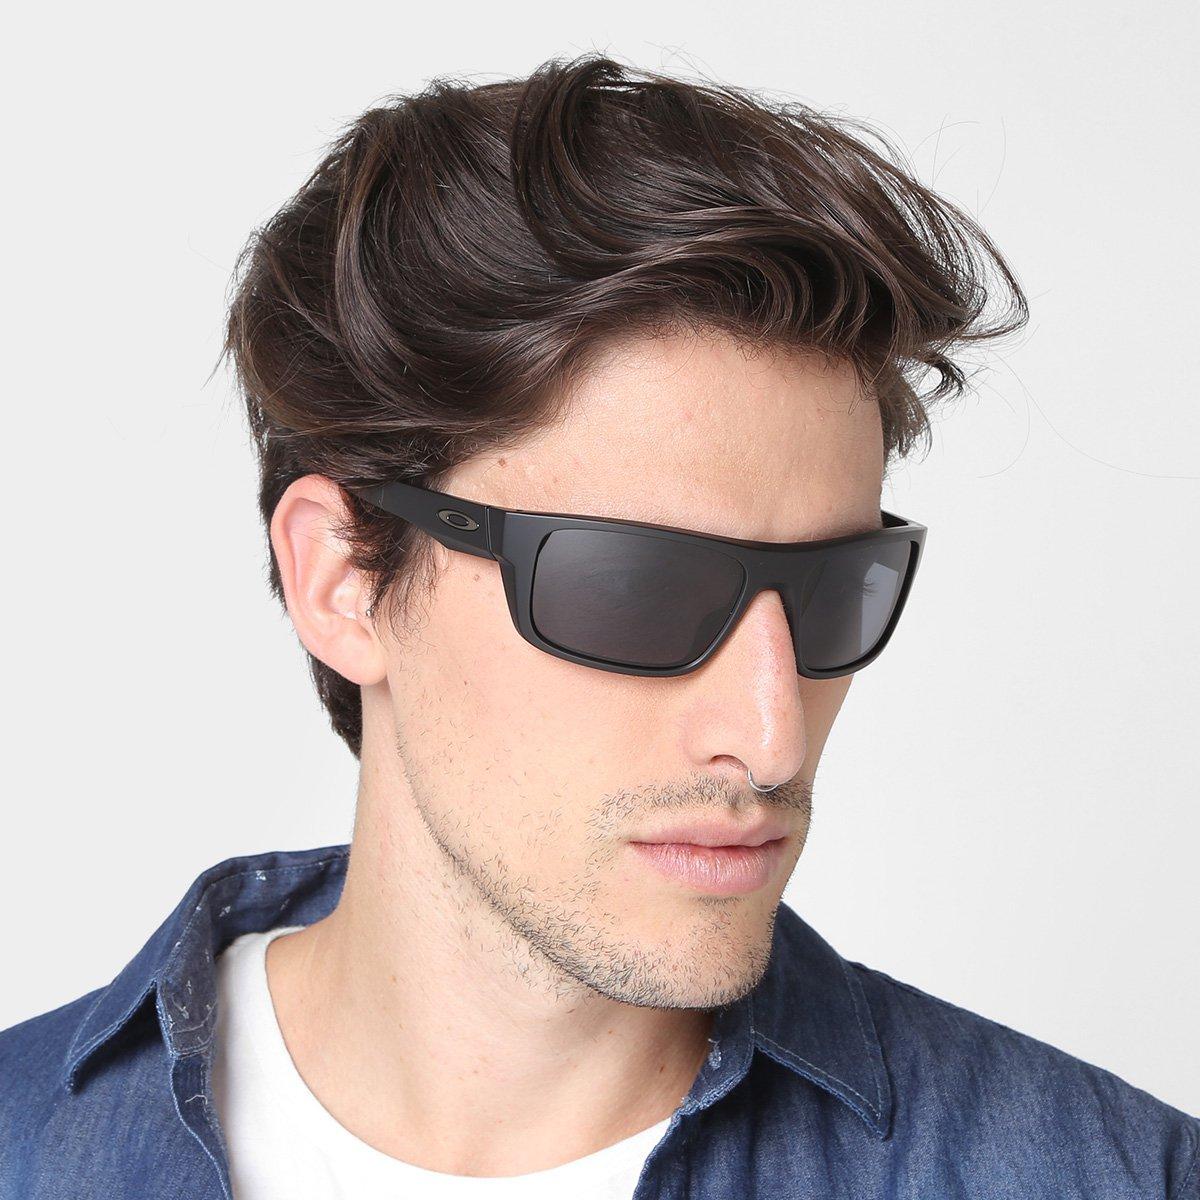 Óculos de Sol Oakley Drop Point Masculino - Preto e Cinza - Compre ... 6cd4f136f6